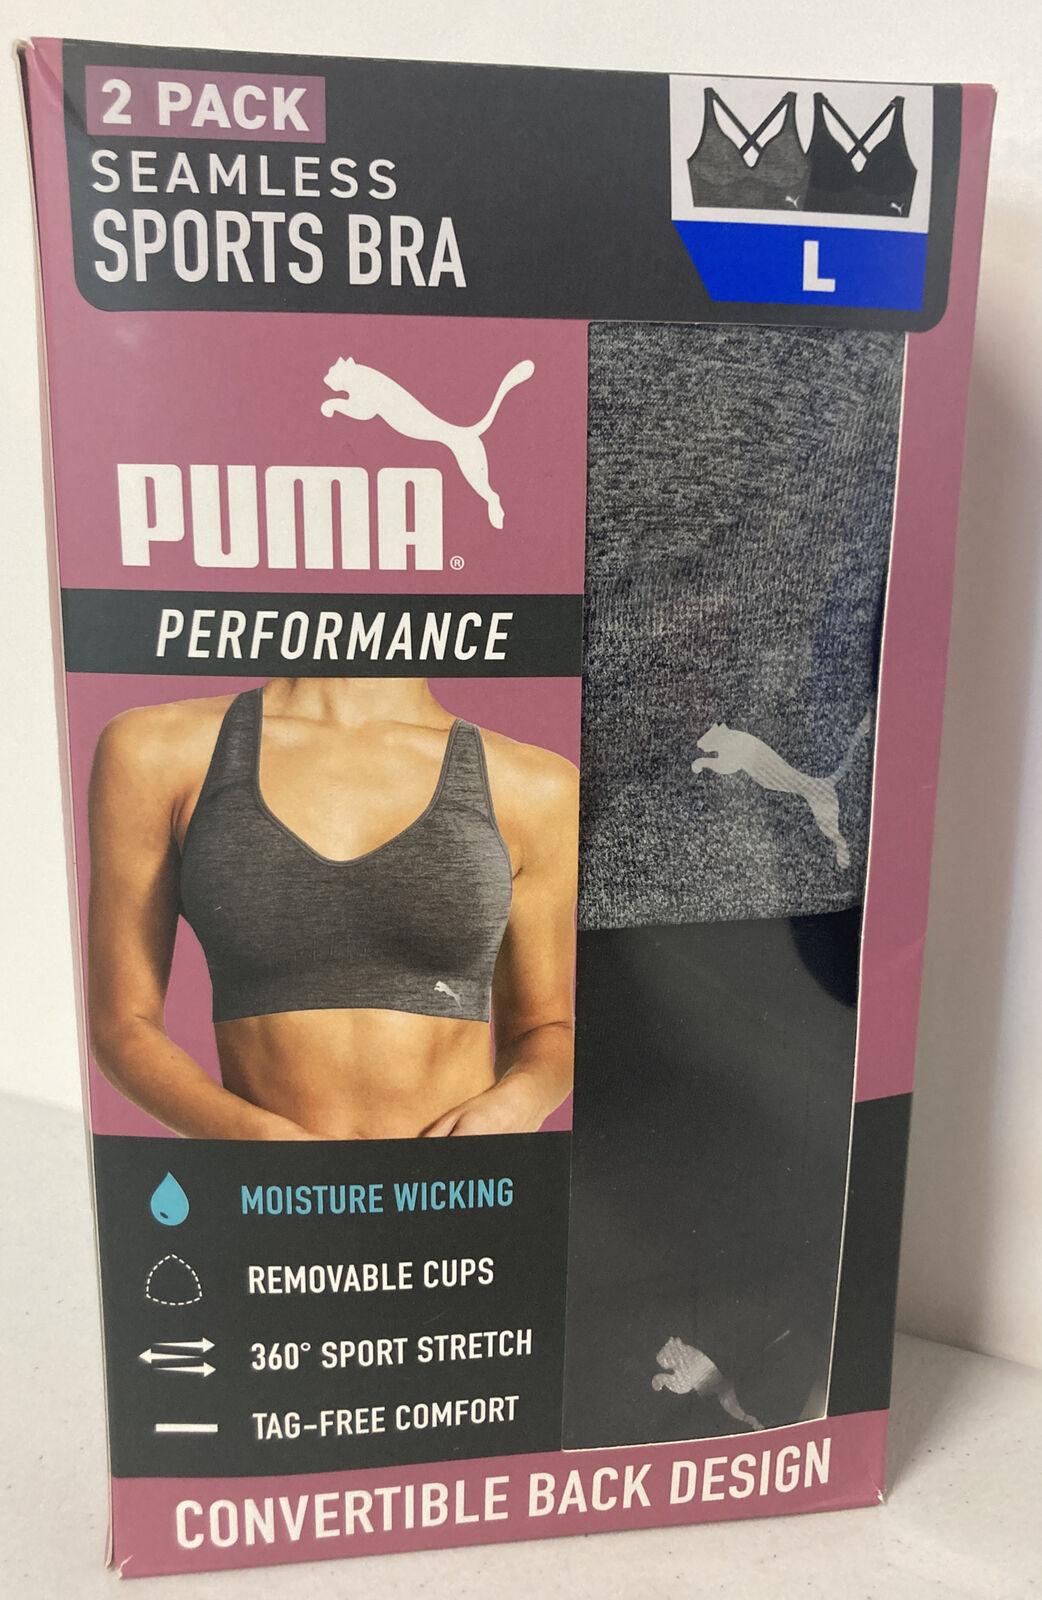 PUMA Womens 2 Pack Seamless Sports Bra LARGE Convertible Back BLACK/GREY DryCell